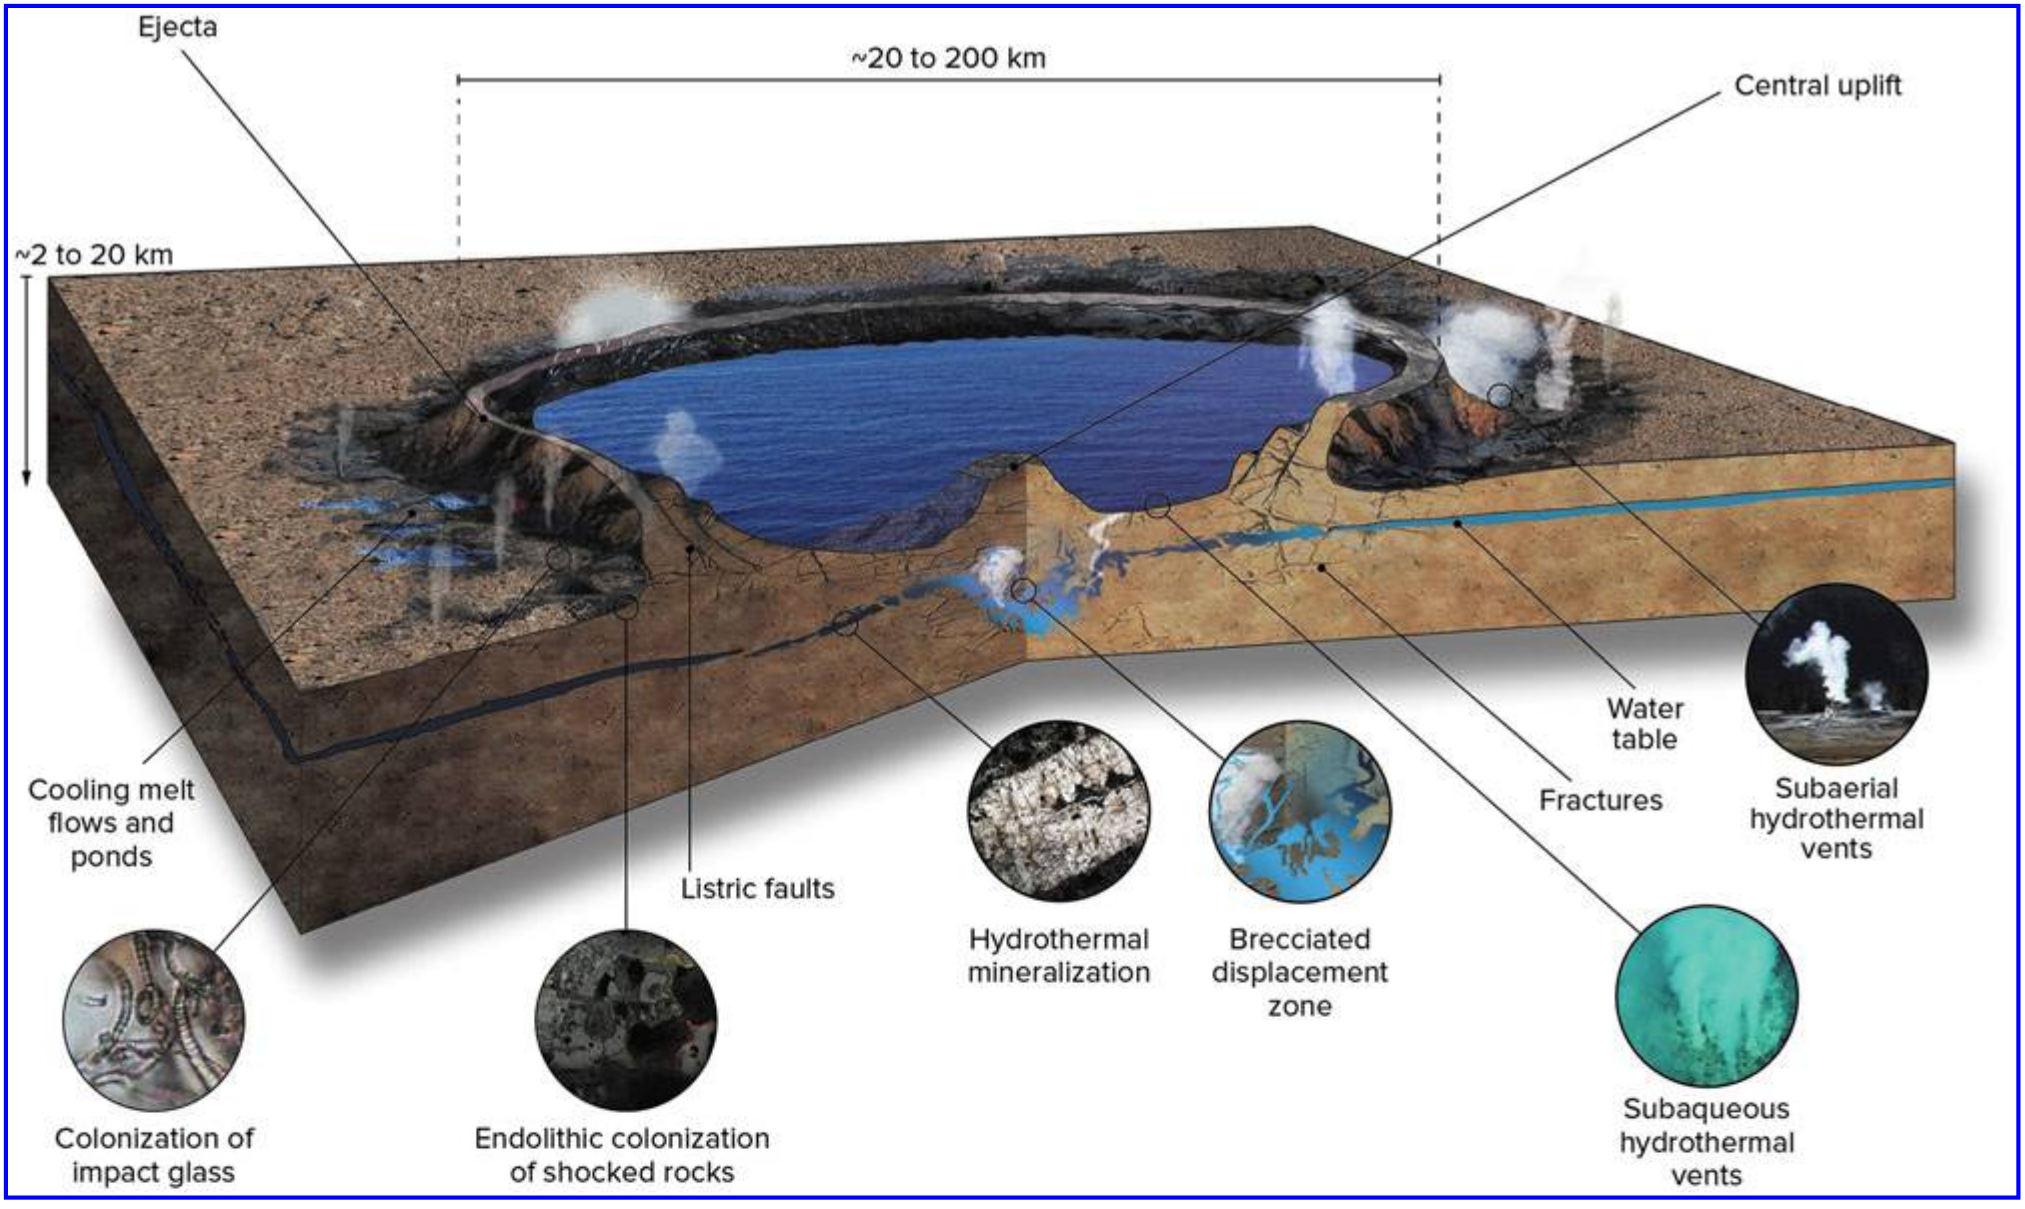 "Гидротермальная фаза развития ударного кратера. <a href=""https://www.liebertpub.com/doi/10.1089/AST.2019.2203"">G.Osinski et al., <i>Astrobiology</i> <b>20</b>, 1121 (2020)</a>."